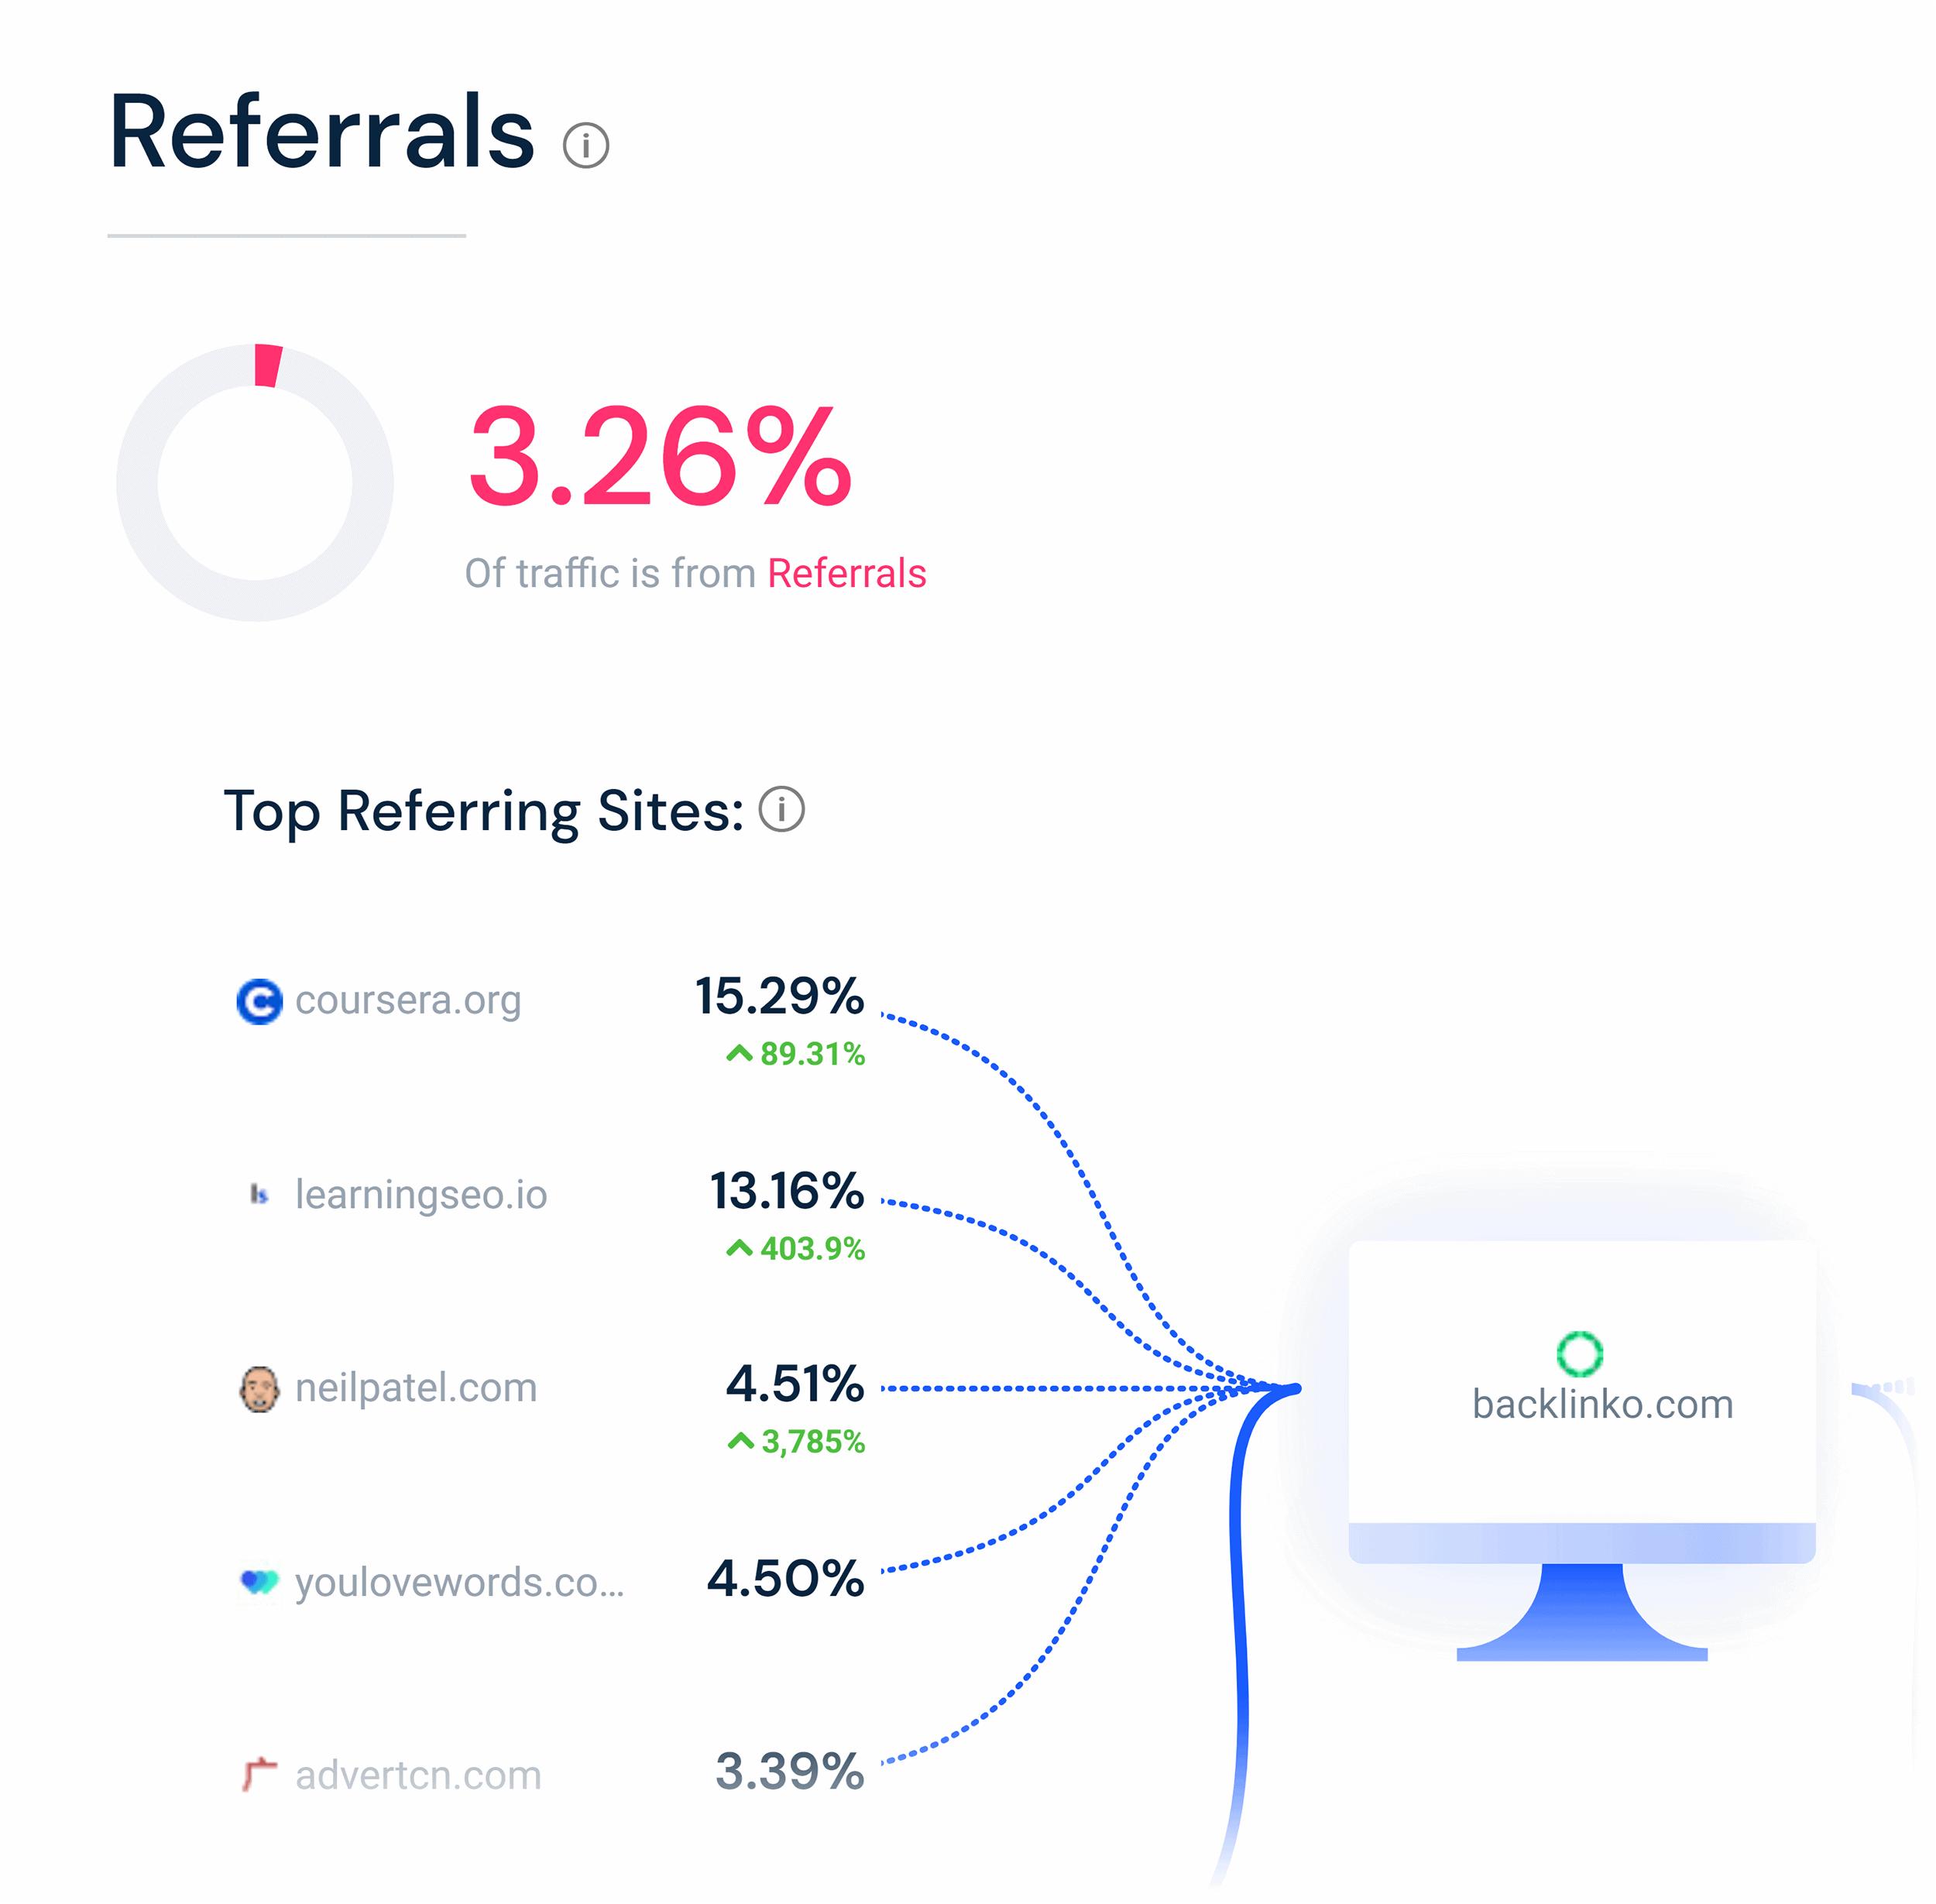 Similarweb – Referrals